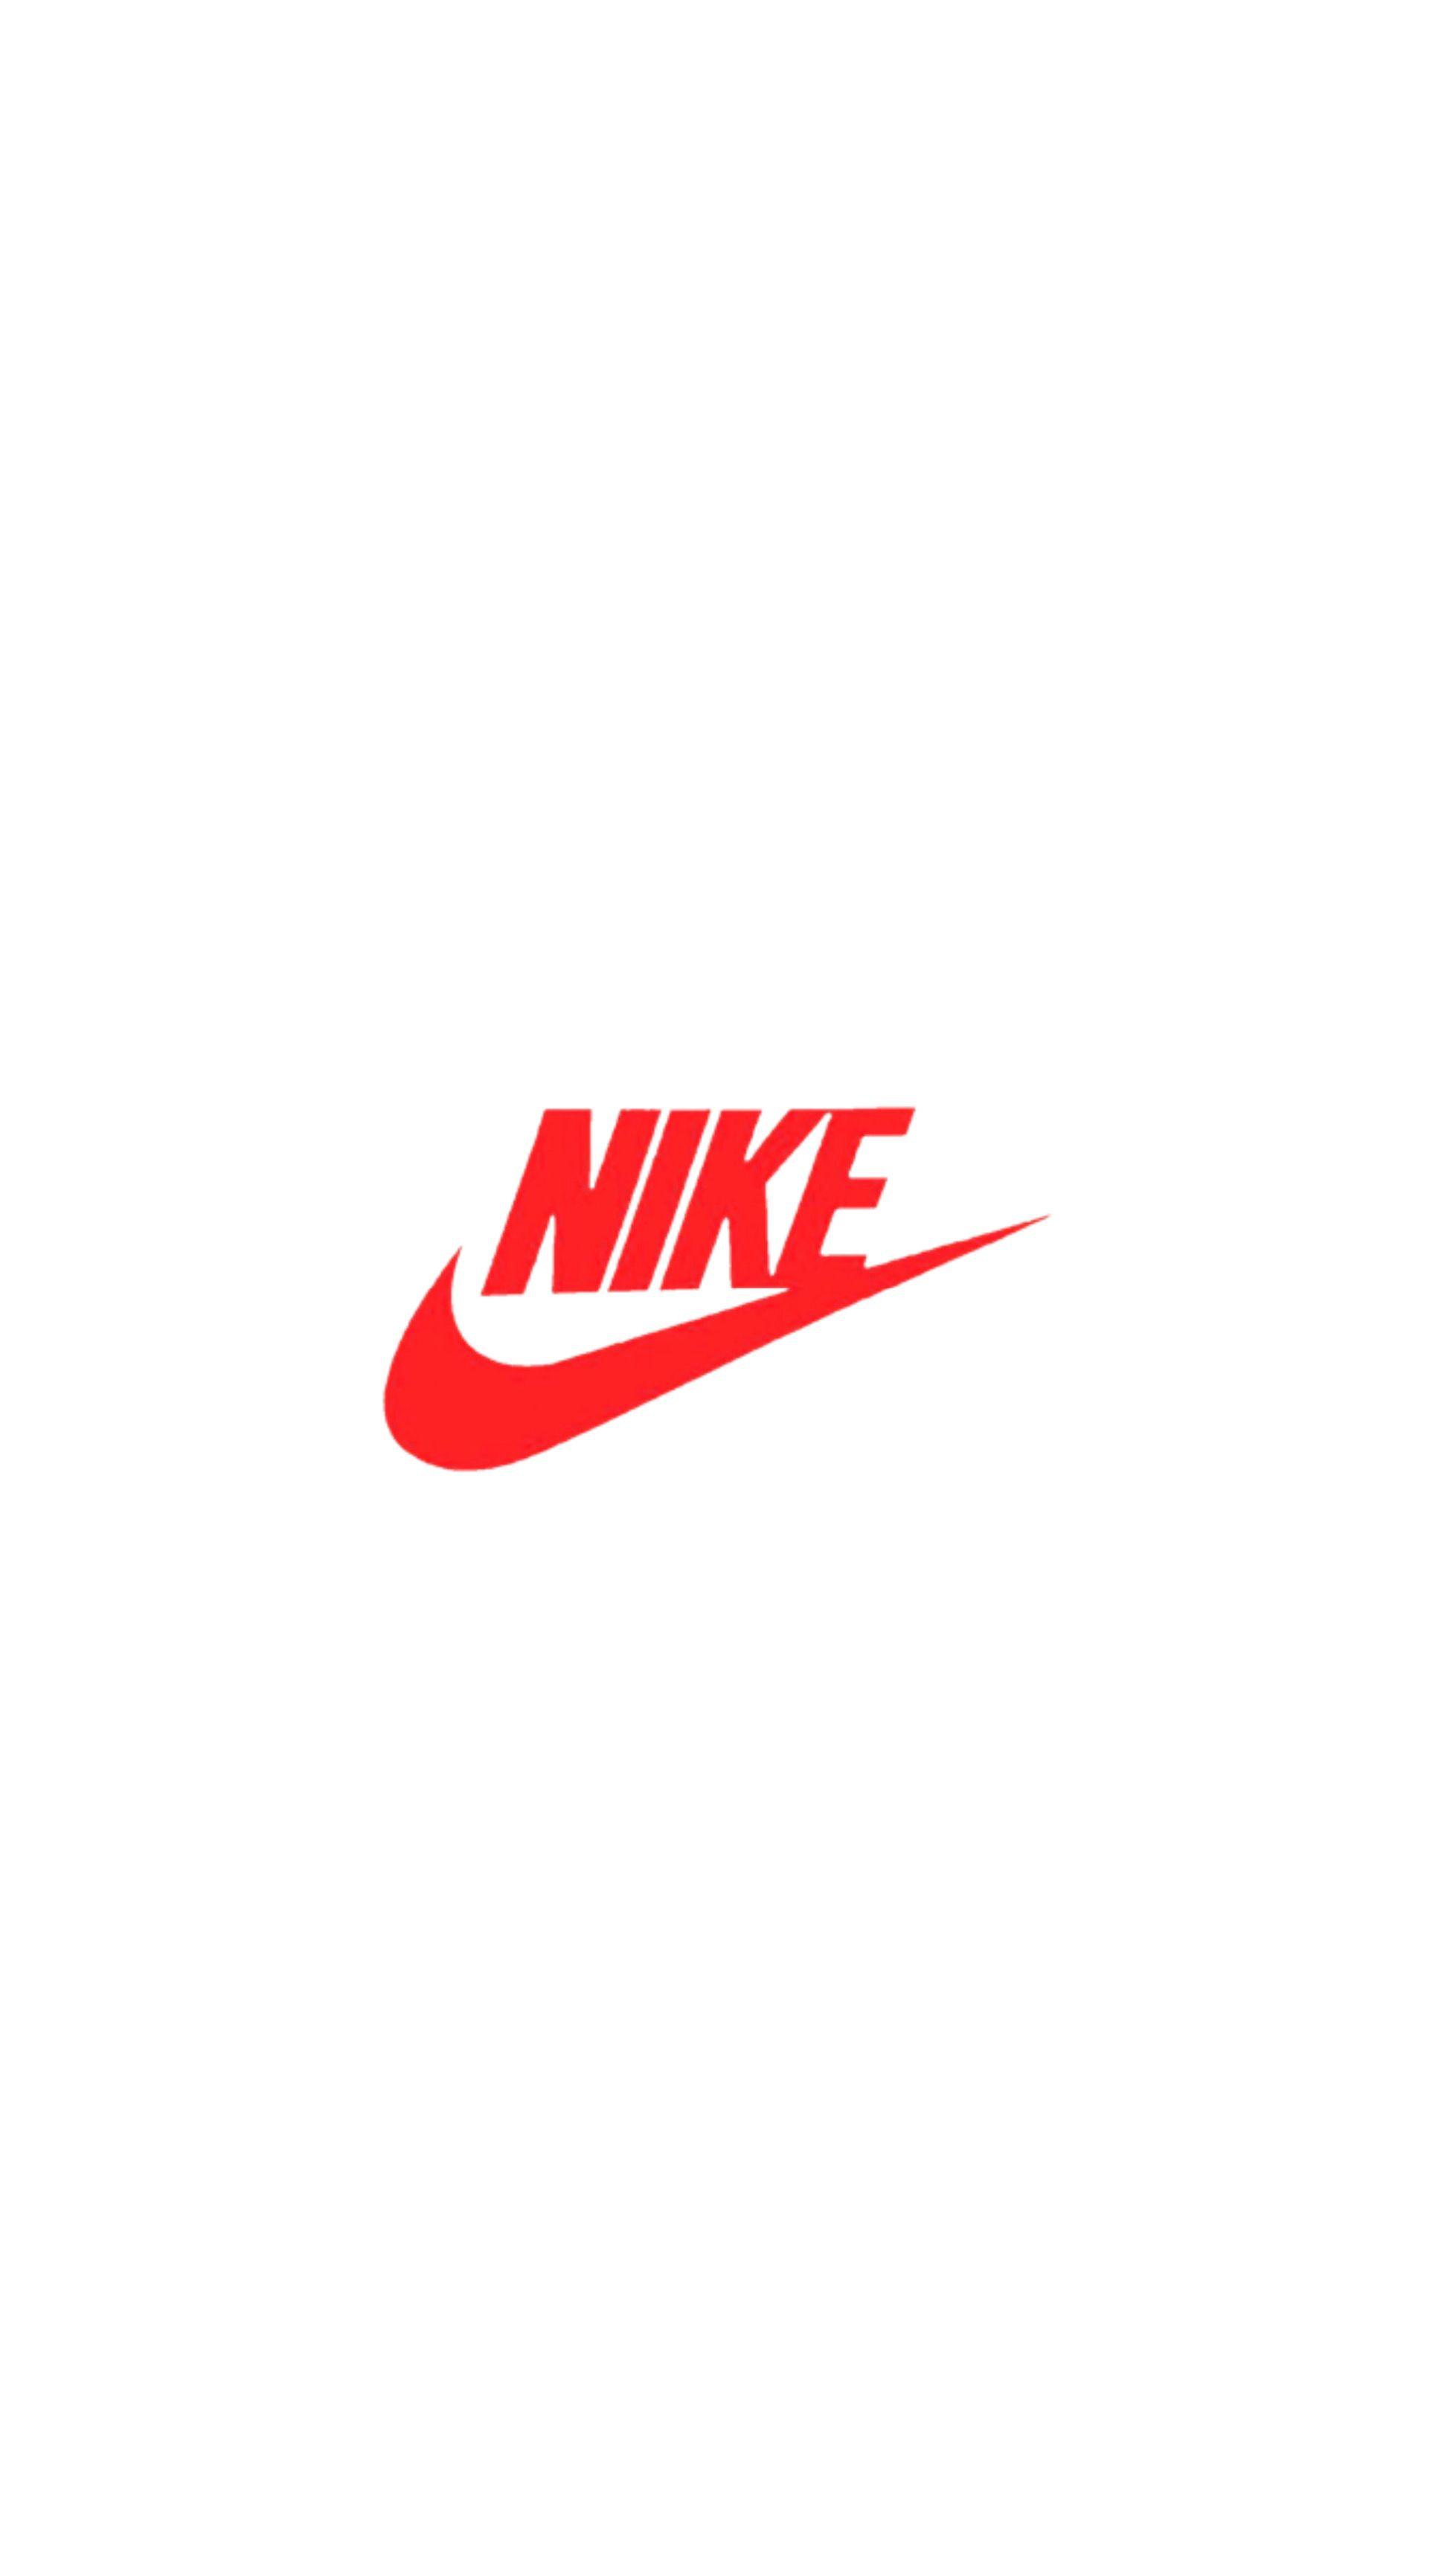 Nike Logo Red Nike Wallpaper Cool Nike Wallpapers Blue Wallpaper Iphone